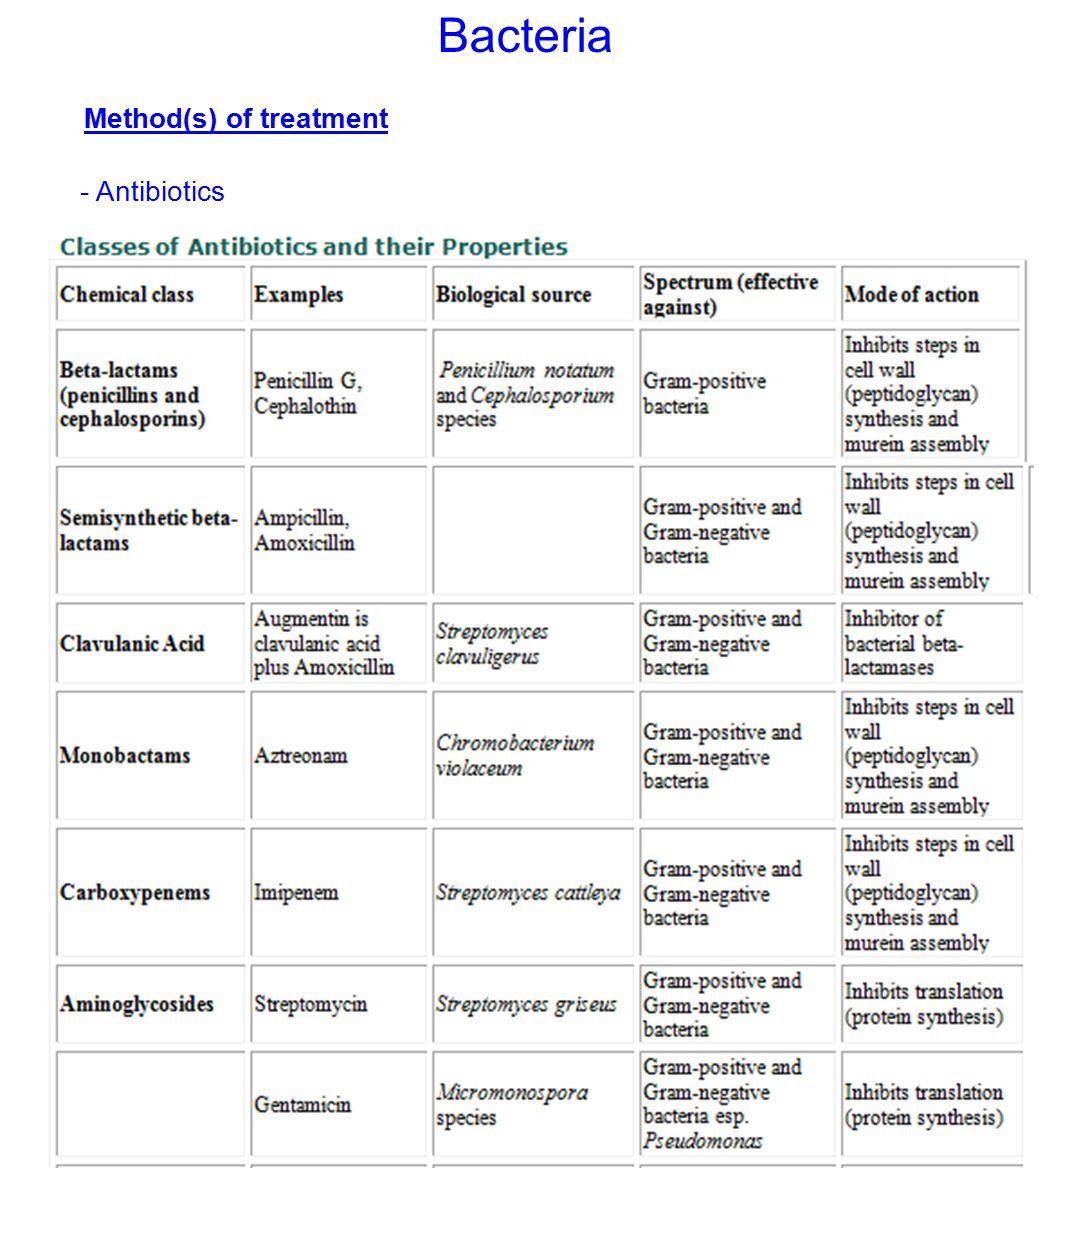 Bacteria Method(s) of treatment - Antibiotics